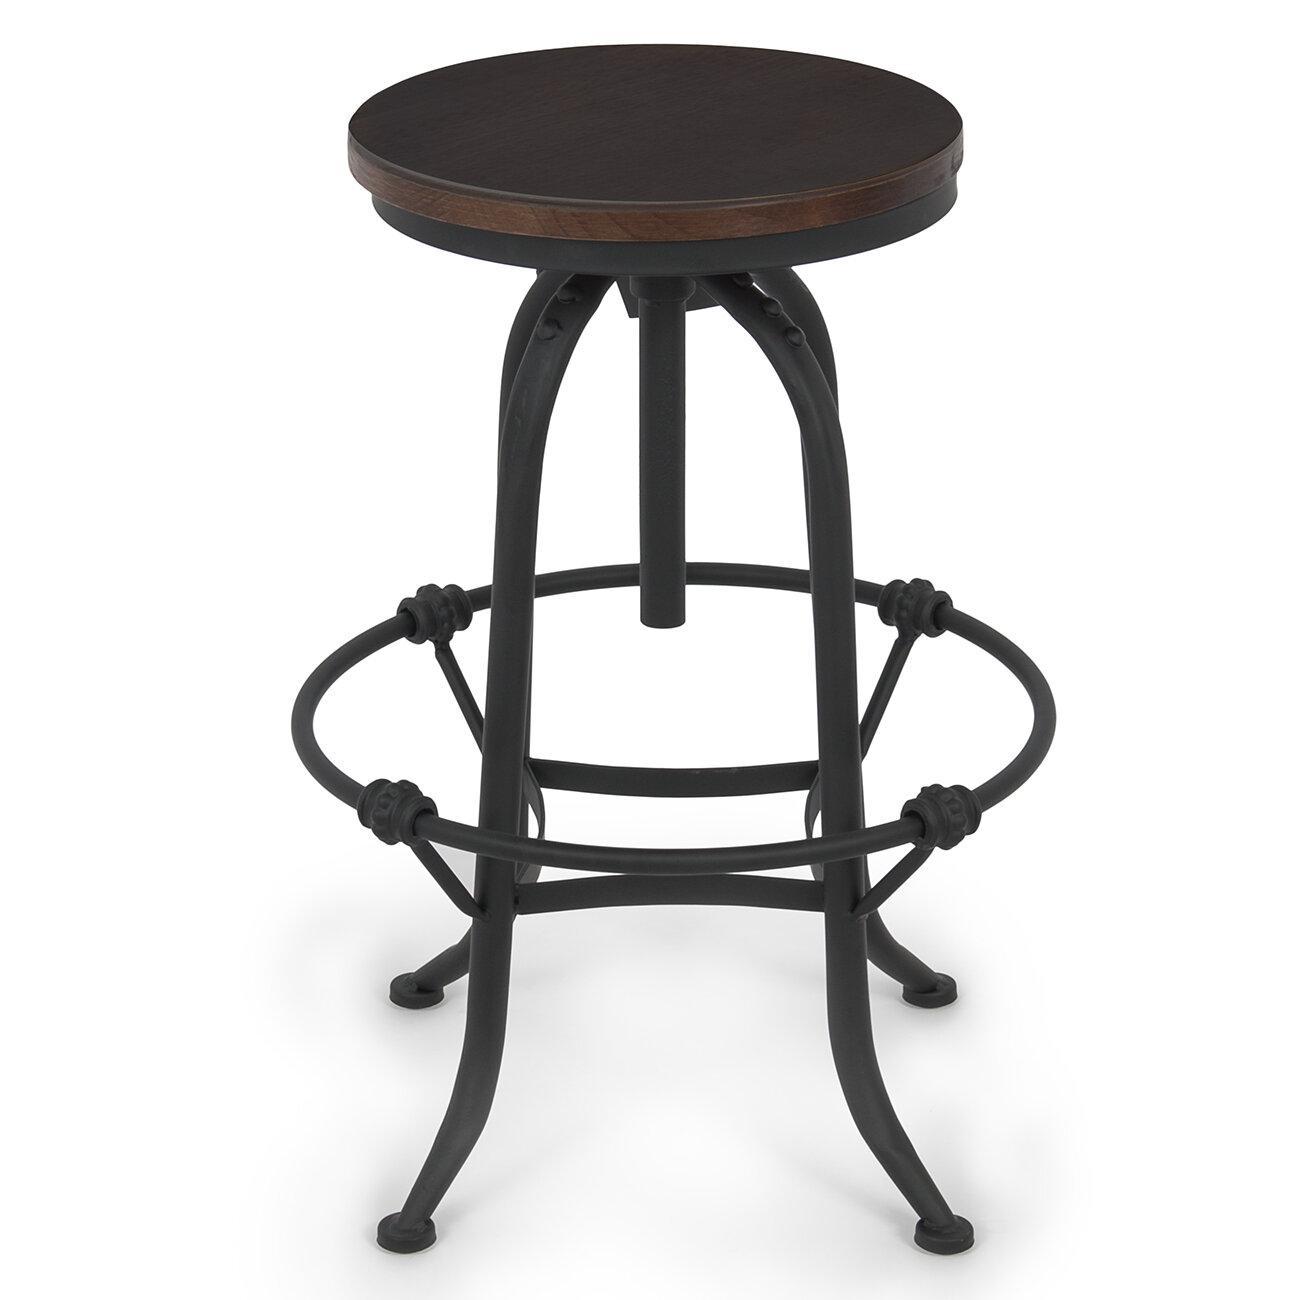 Belleze Adjustable Height Swivel Bar Stool eBay : 1 from www.ebay.com size 1300 x 1300 jpeg 128kB